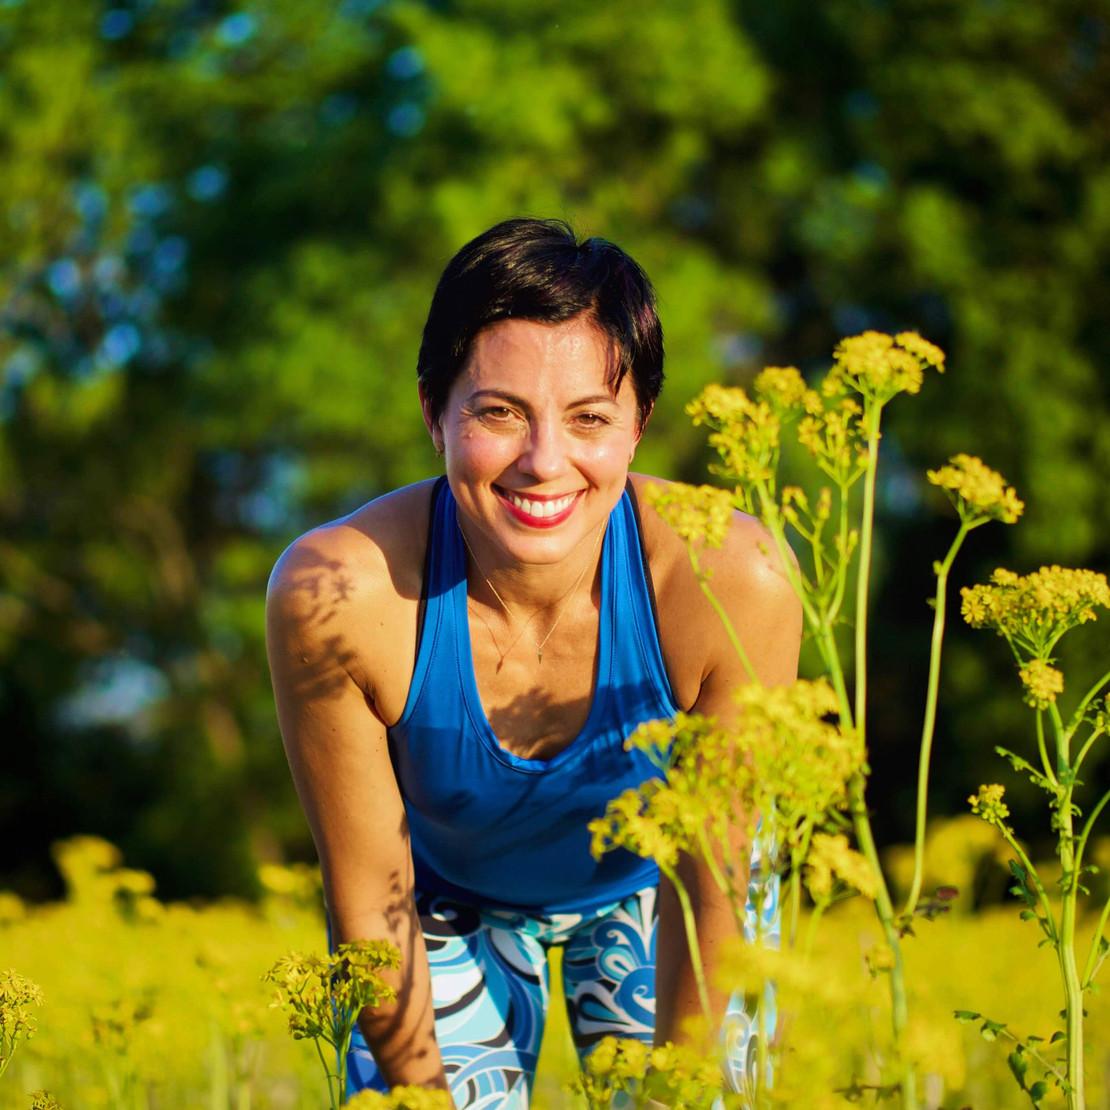 Empowering Women Series: Valerie Knopik